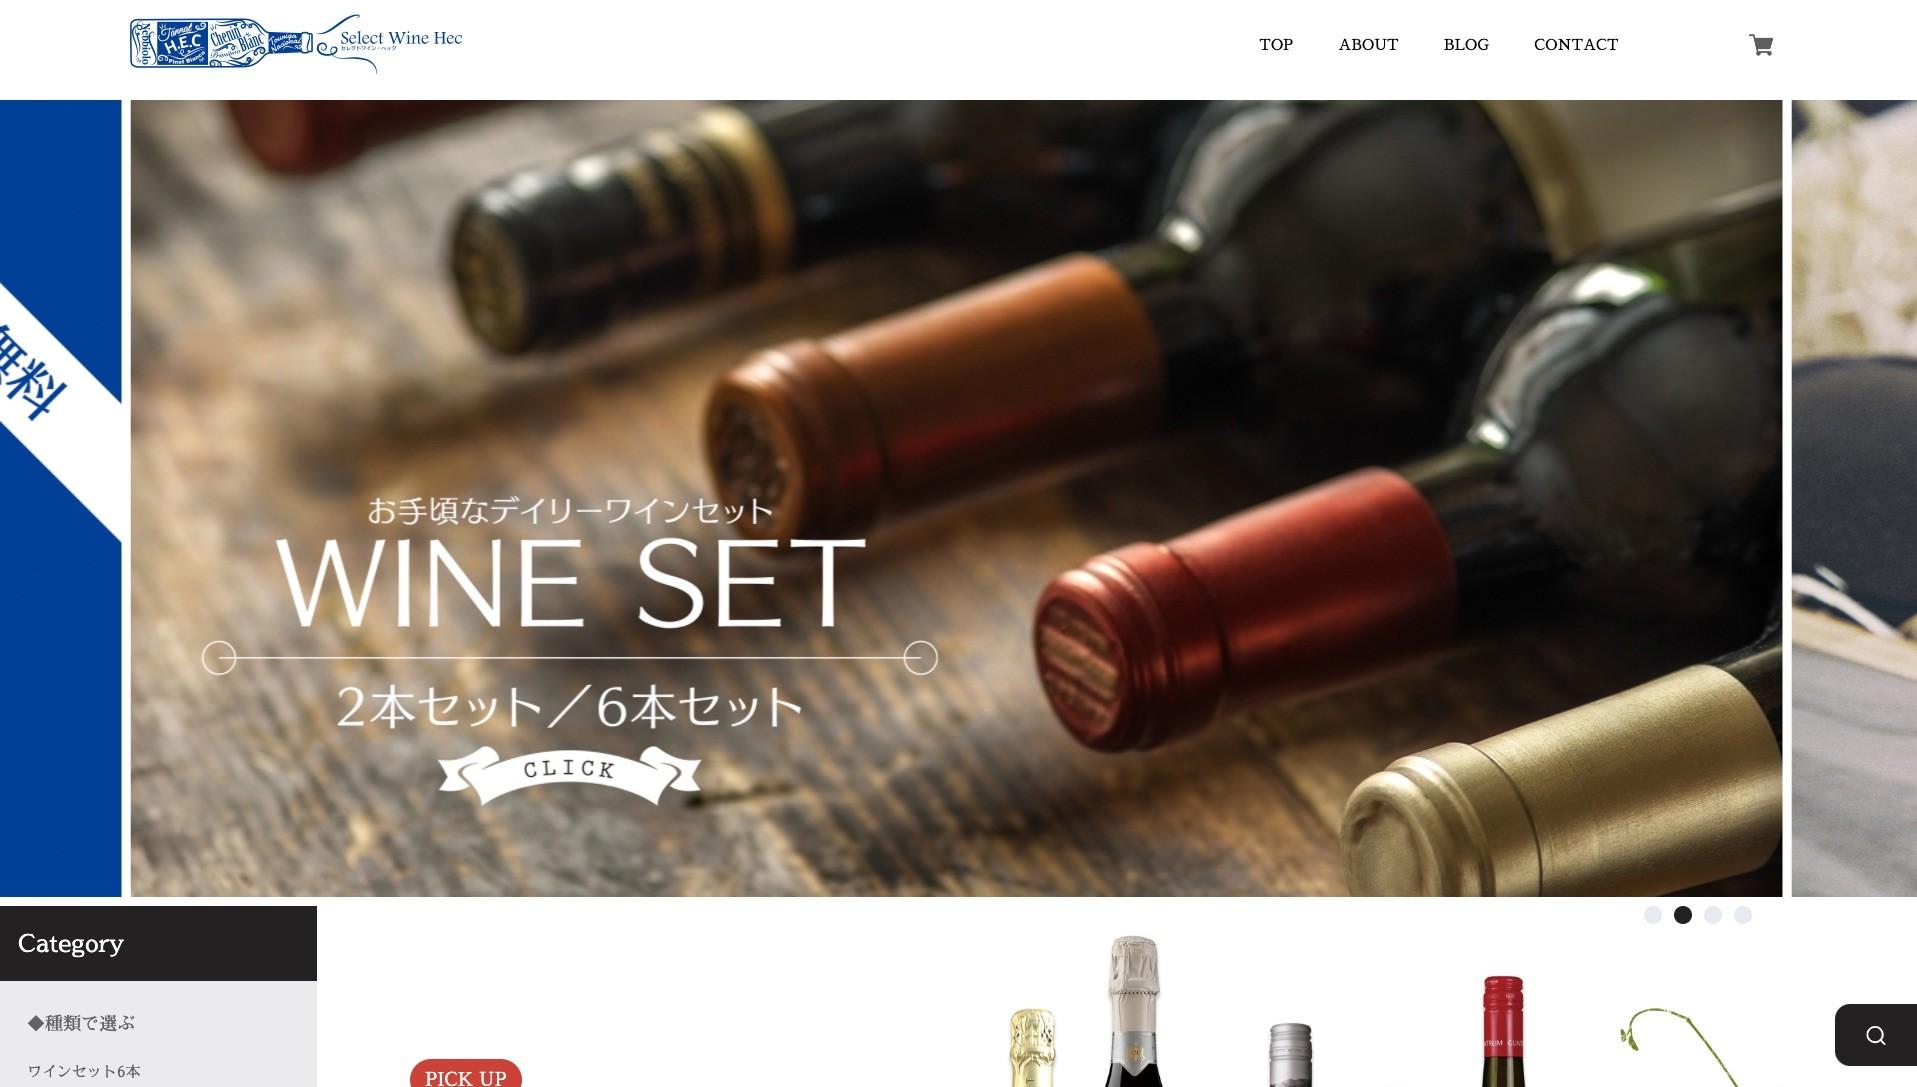 Select Wine Hec